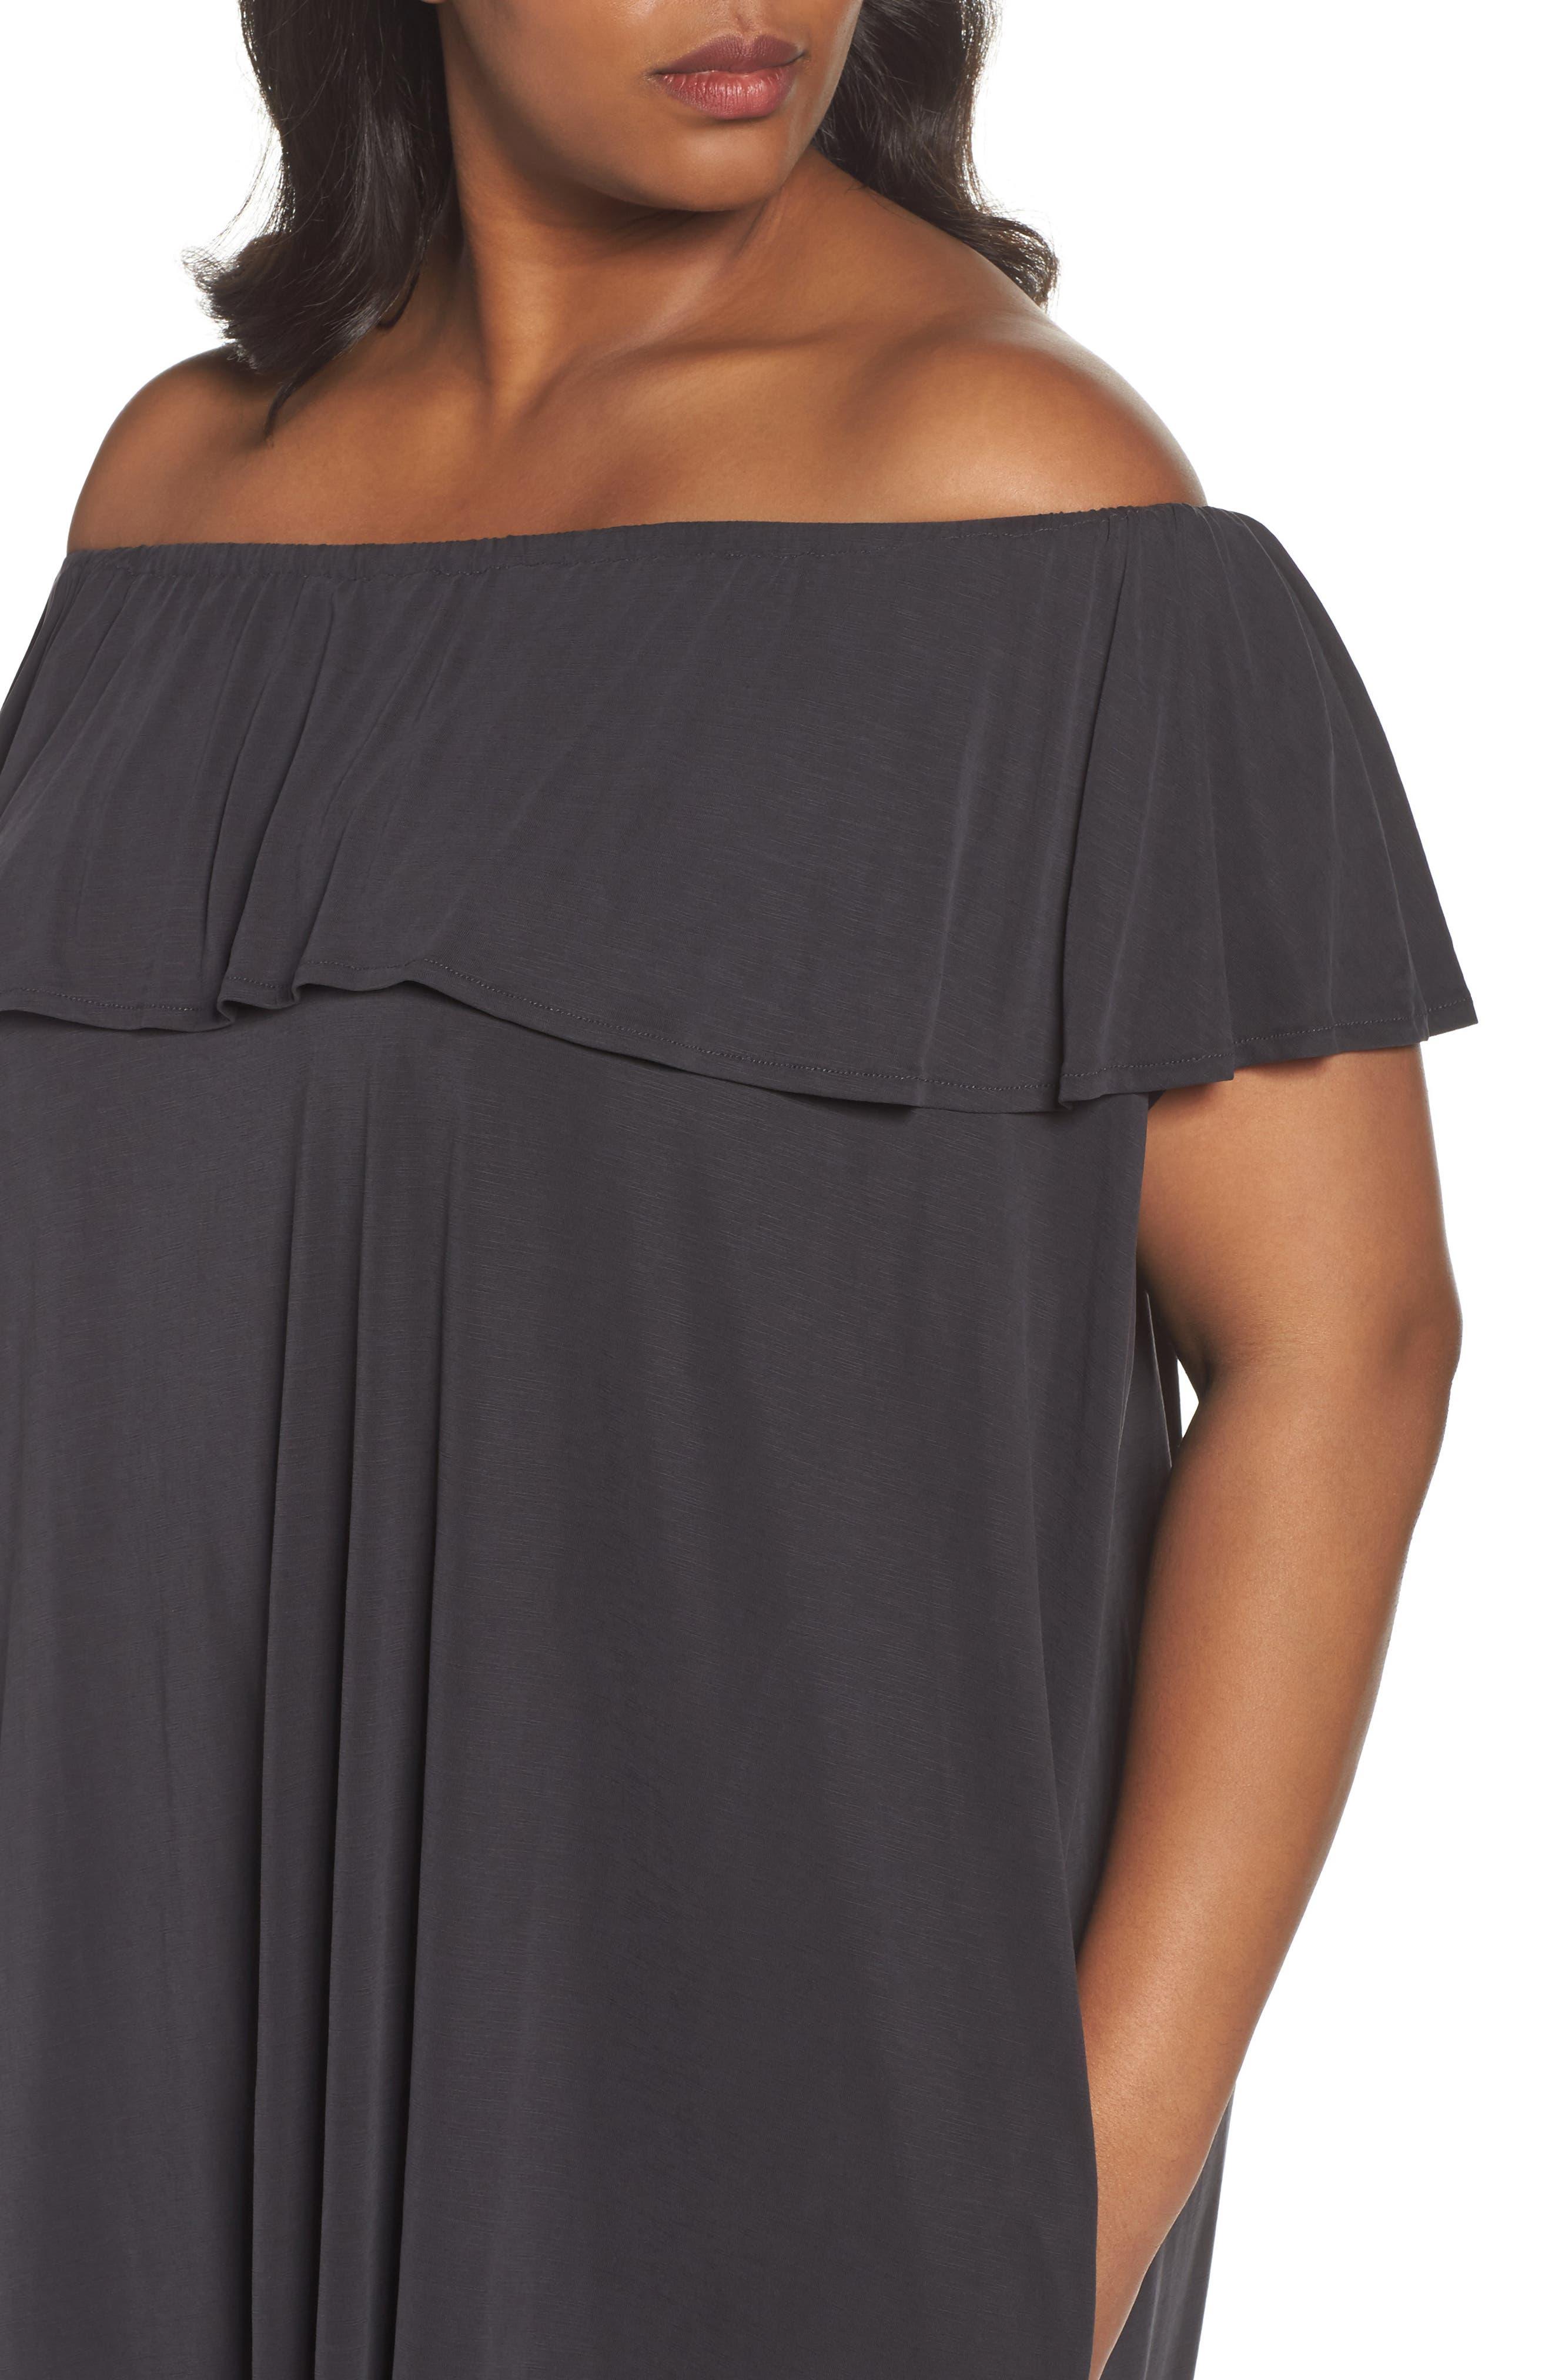 Boardwalk Convertible Jersey Dress,                             Alternate thumbnail 4, color,                             Washed Black